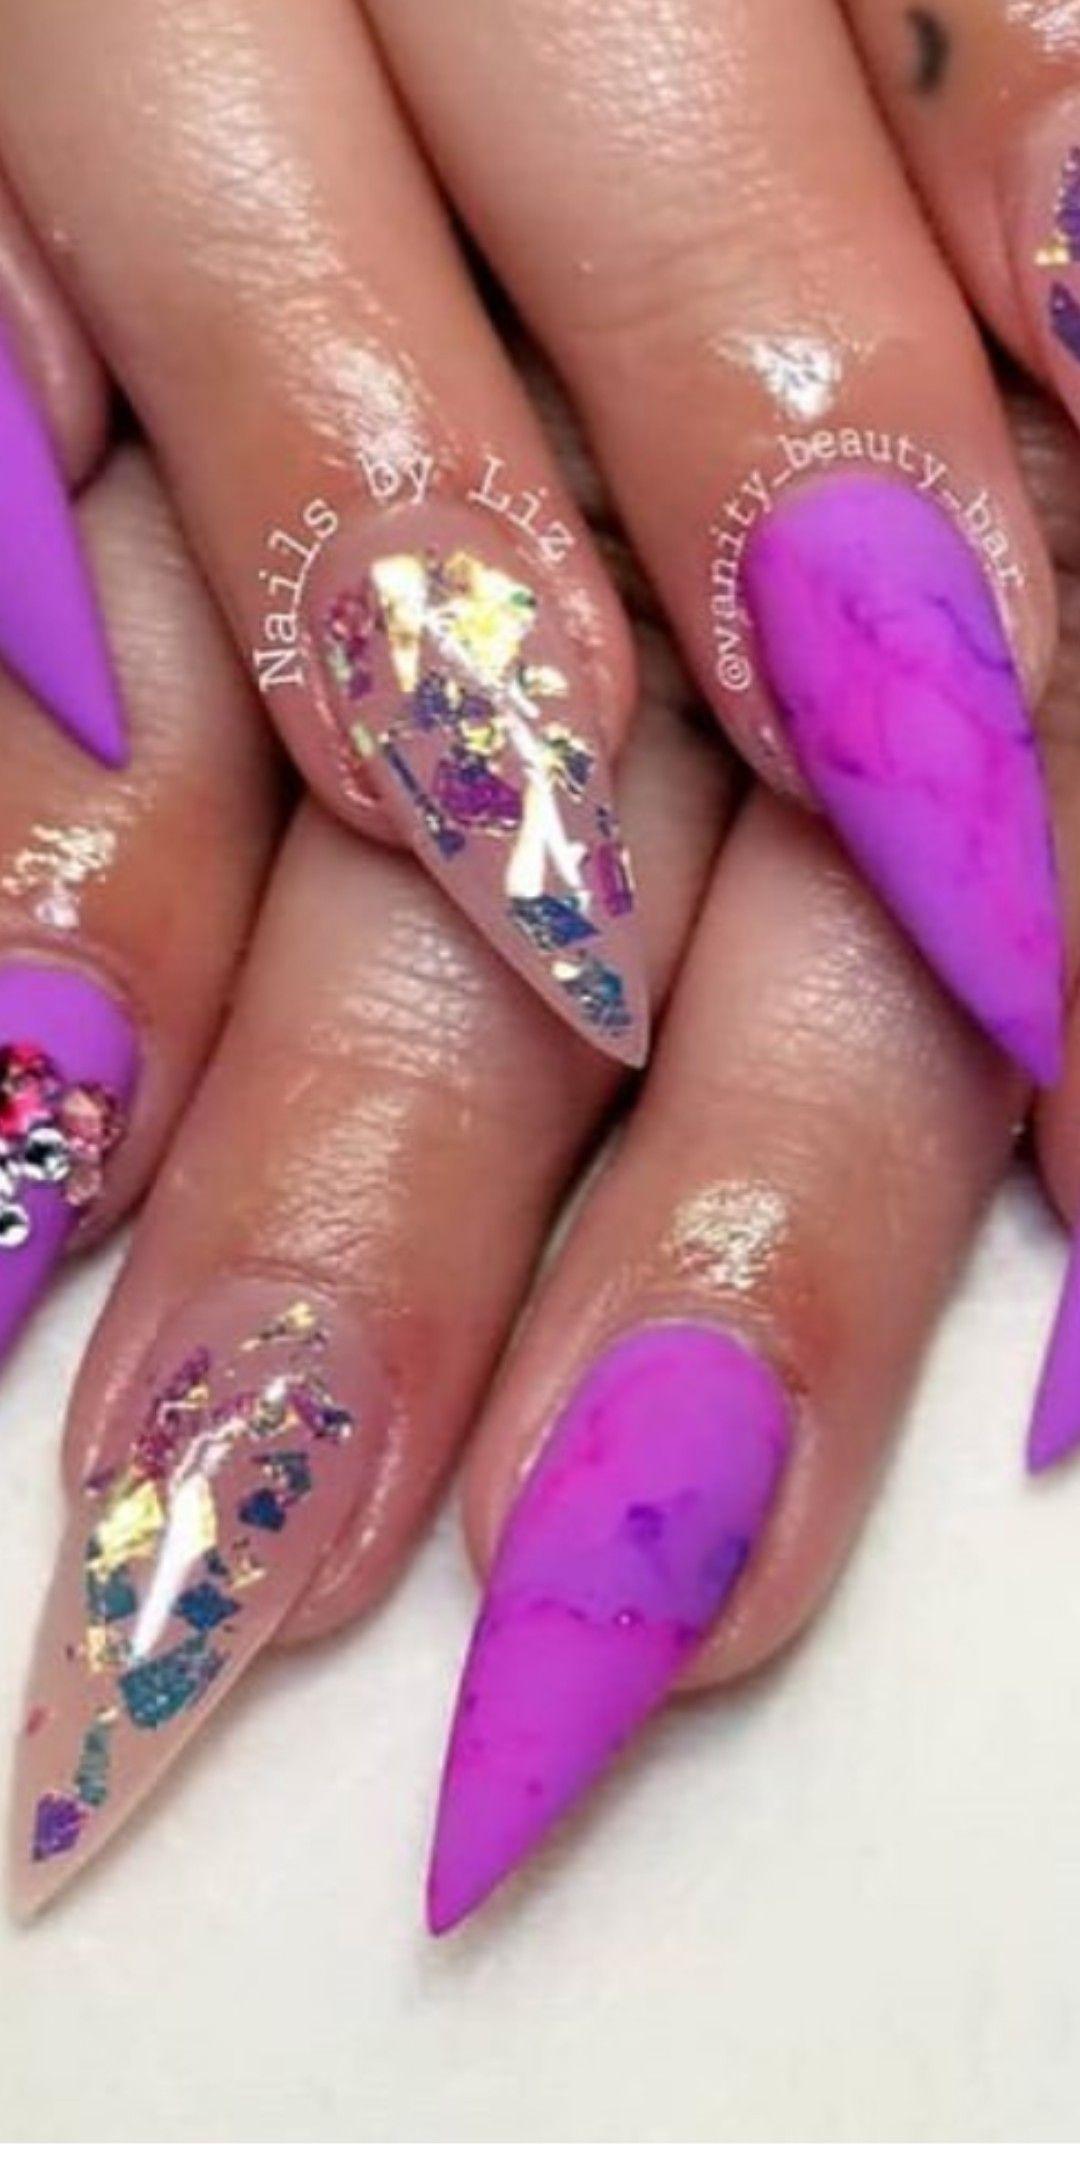 Magenta Marbled Nails With Accent Asymmetrical Gold Flecks Marble Nail Designs Nail Designs Magenta Nails